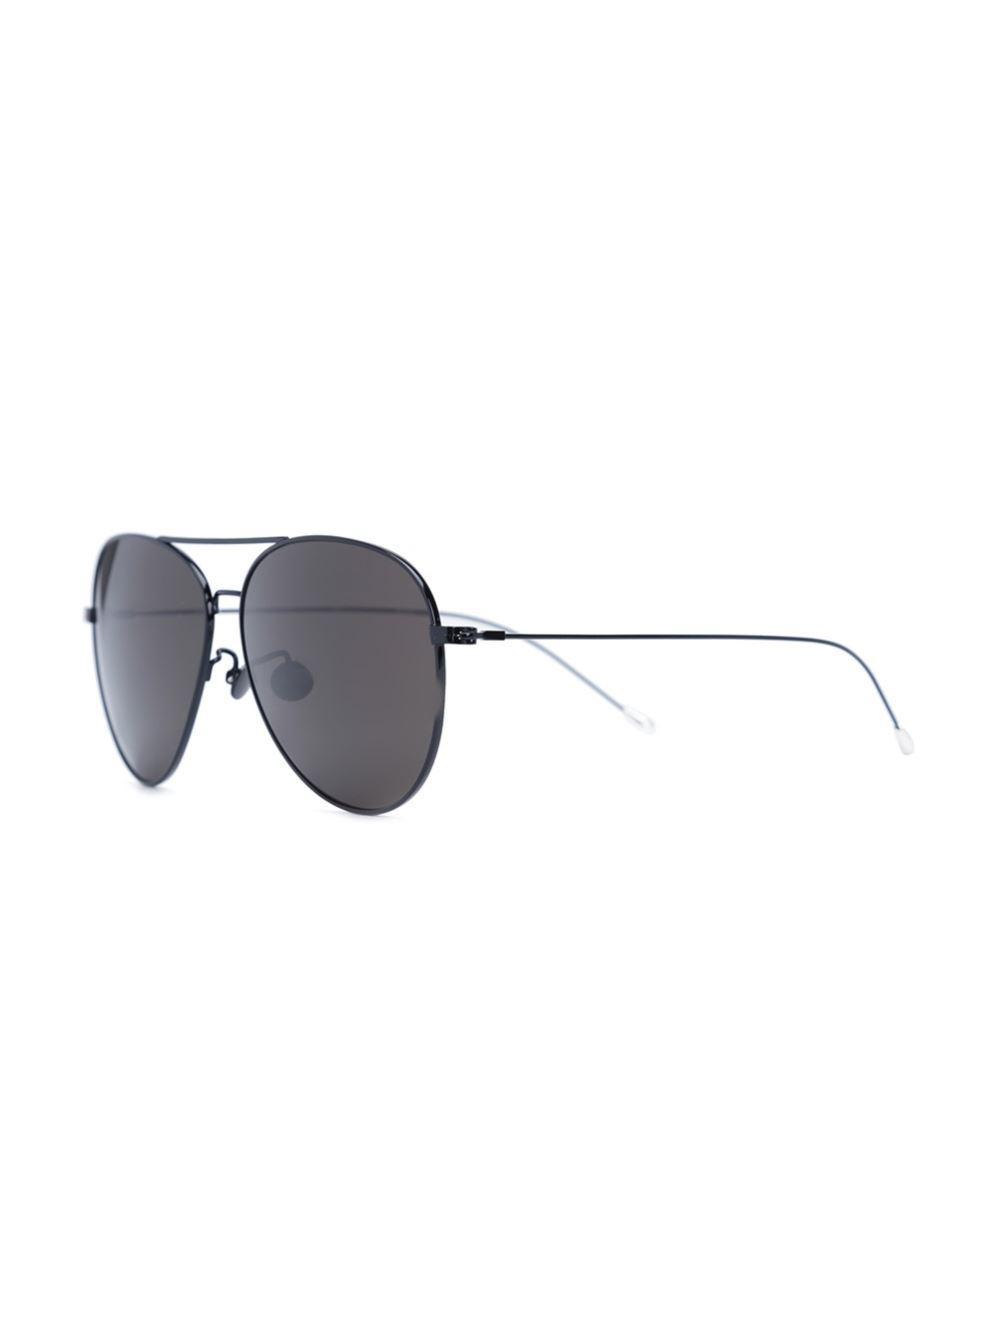 0fe3f85f297 Lyst - Linda Farrow X Ann Demeulemeester Aviator Sunglasses in Black